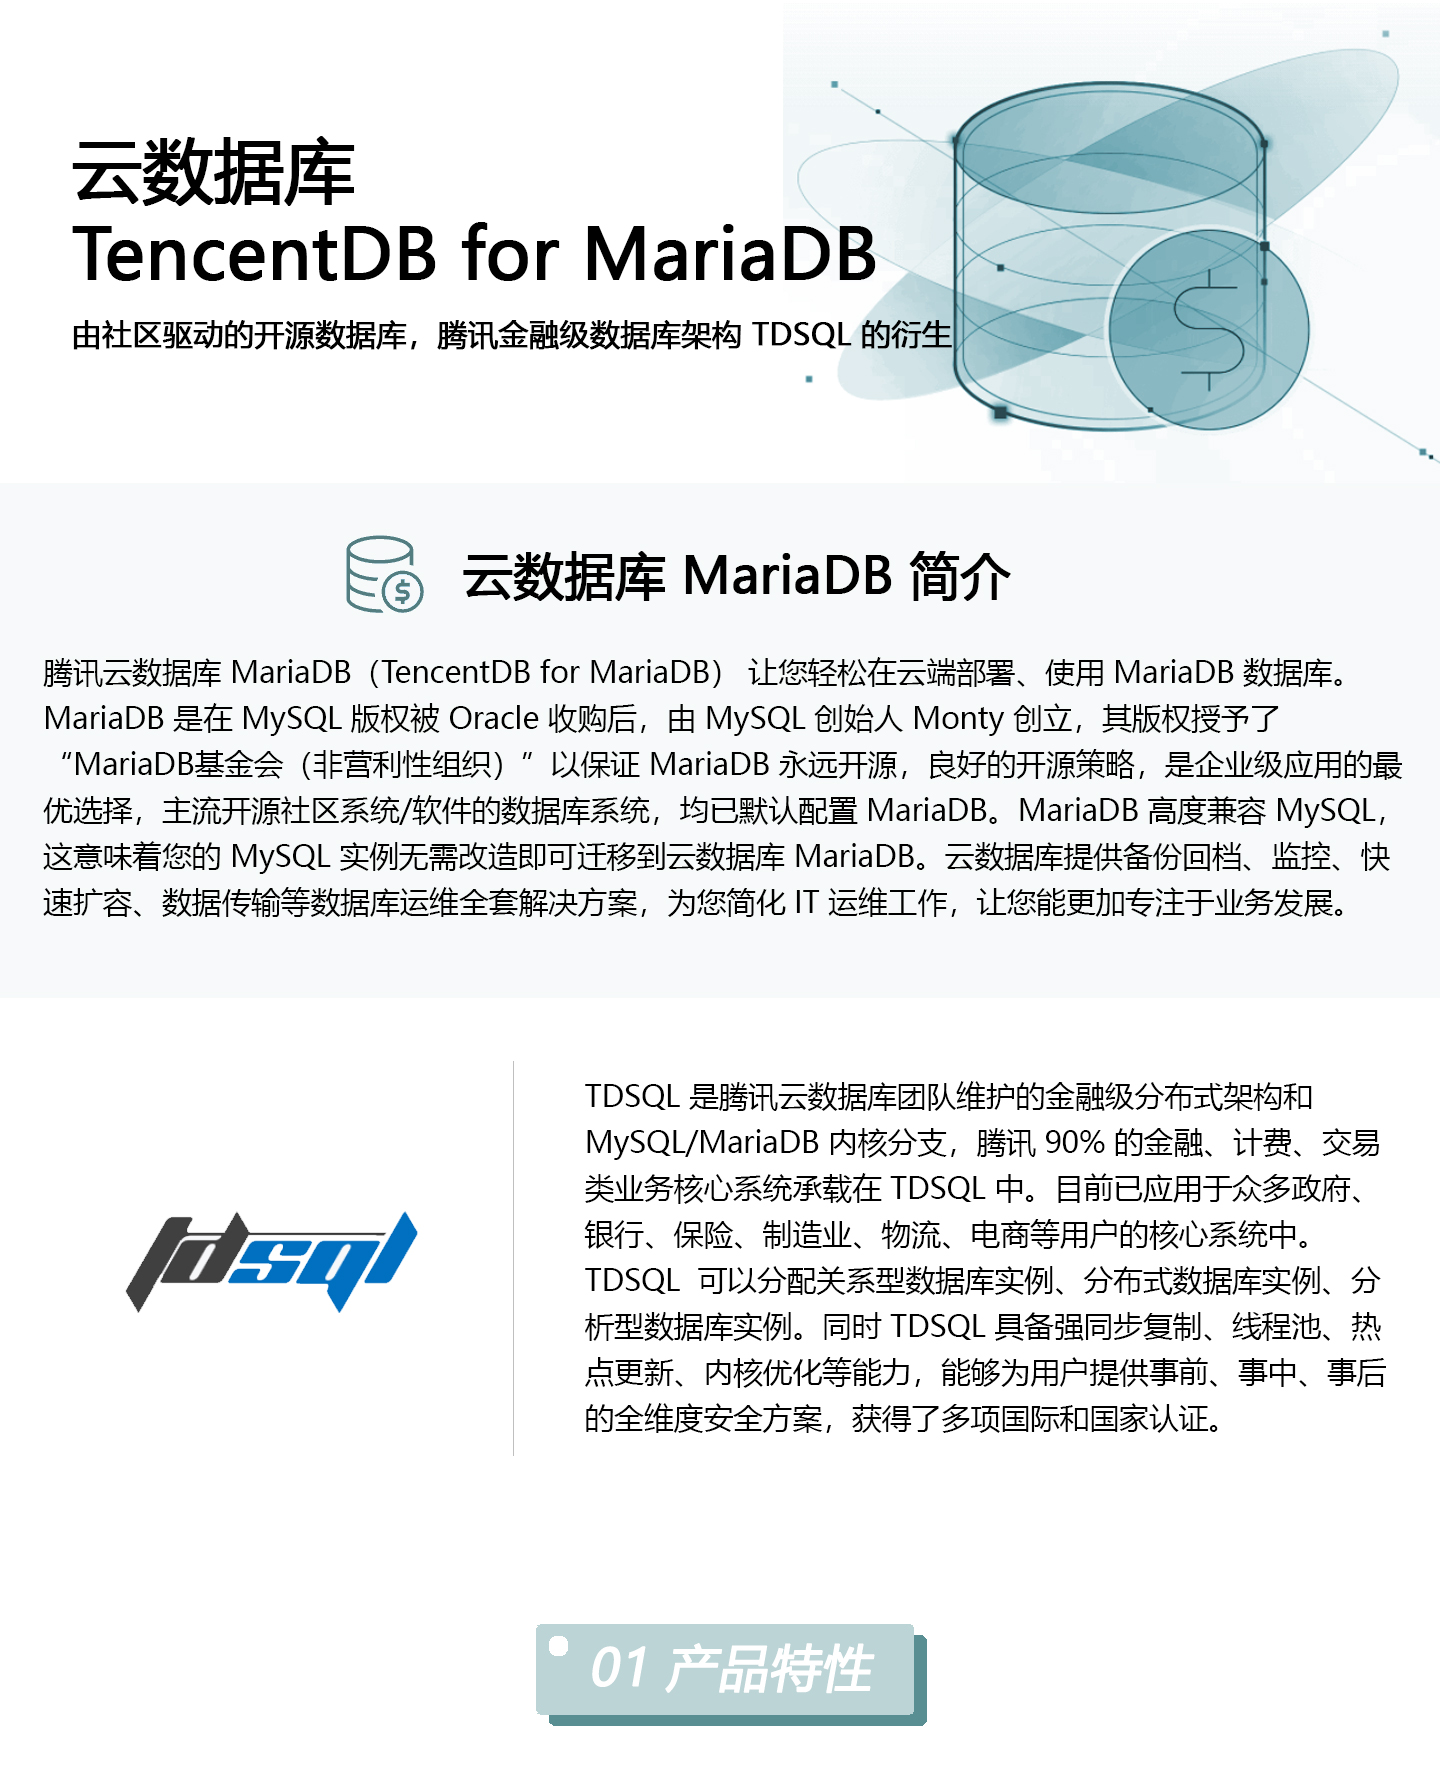 云数据库-TencentDB-for-MariaDB-1440_01.jpg